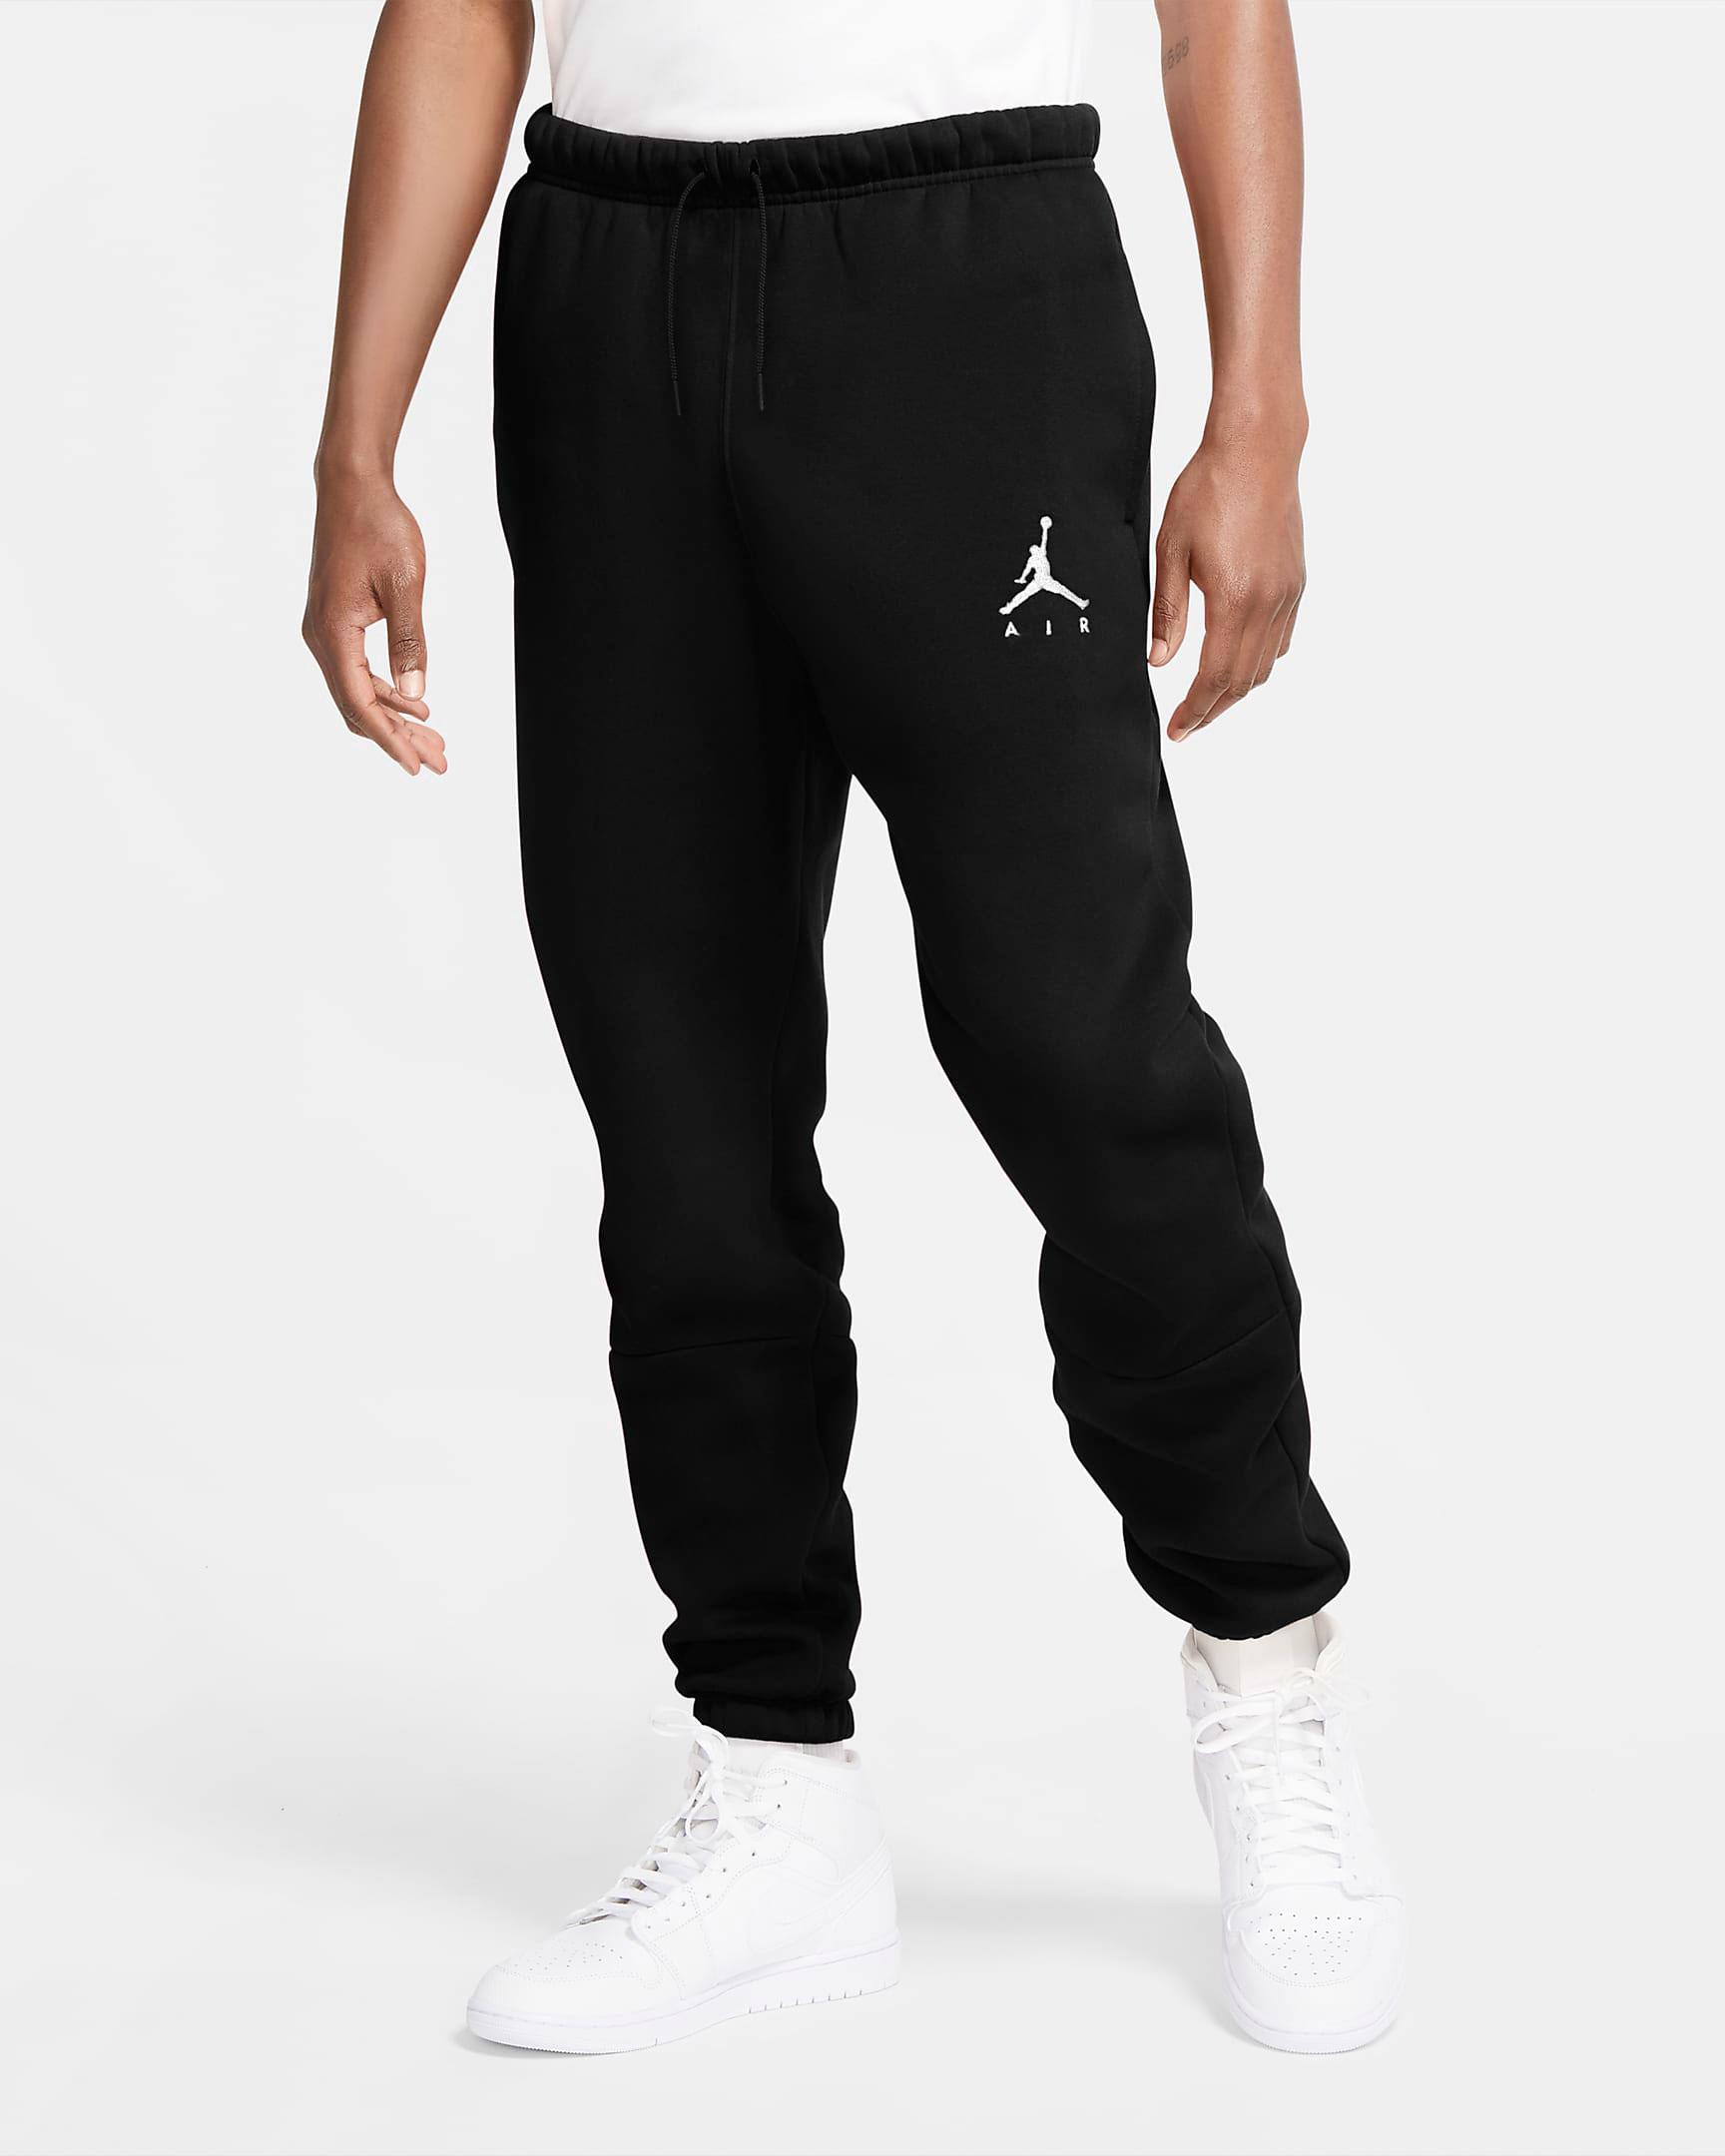 jordan-11-jubilee-black-white-jogger-pants-match